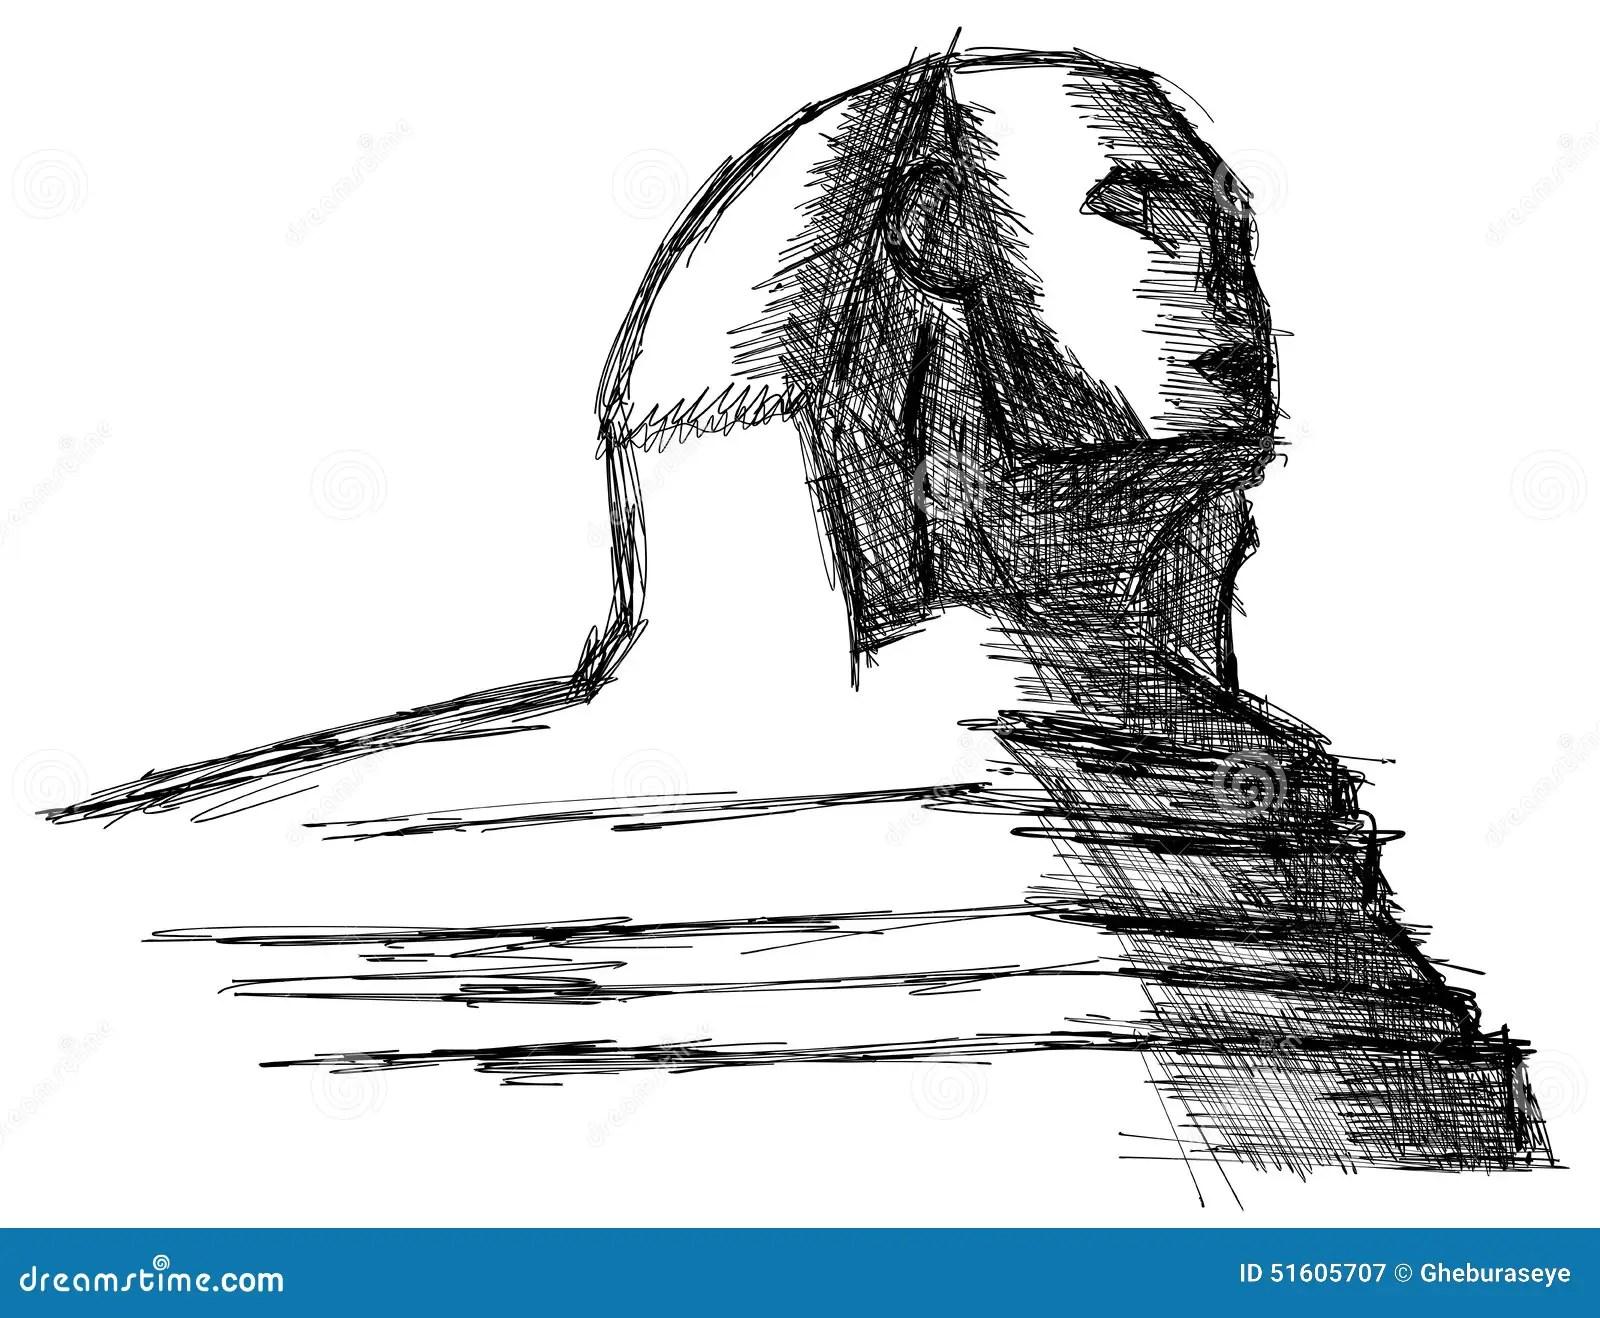 Sphinx Clipart